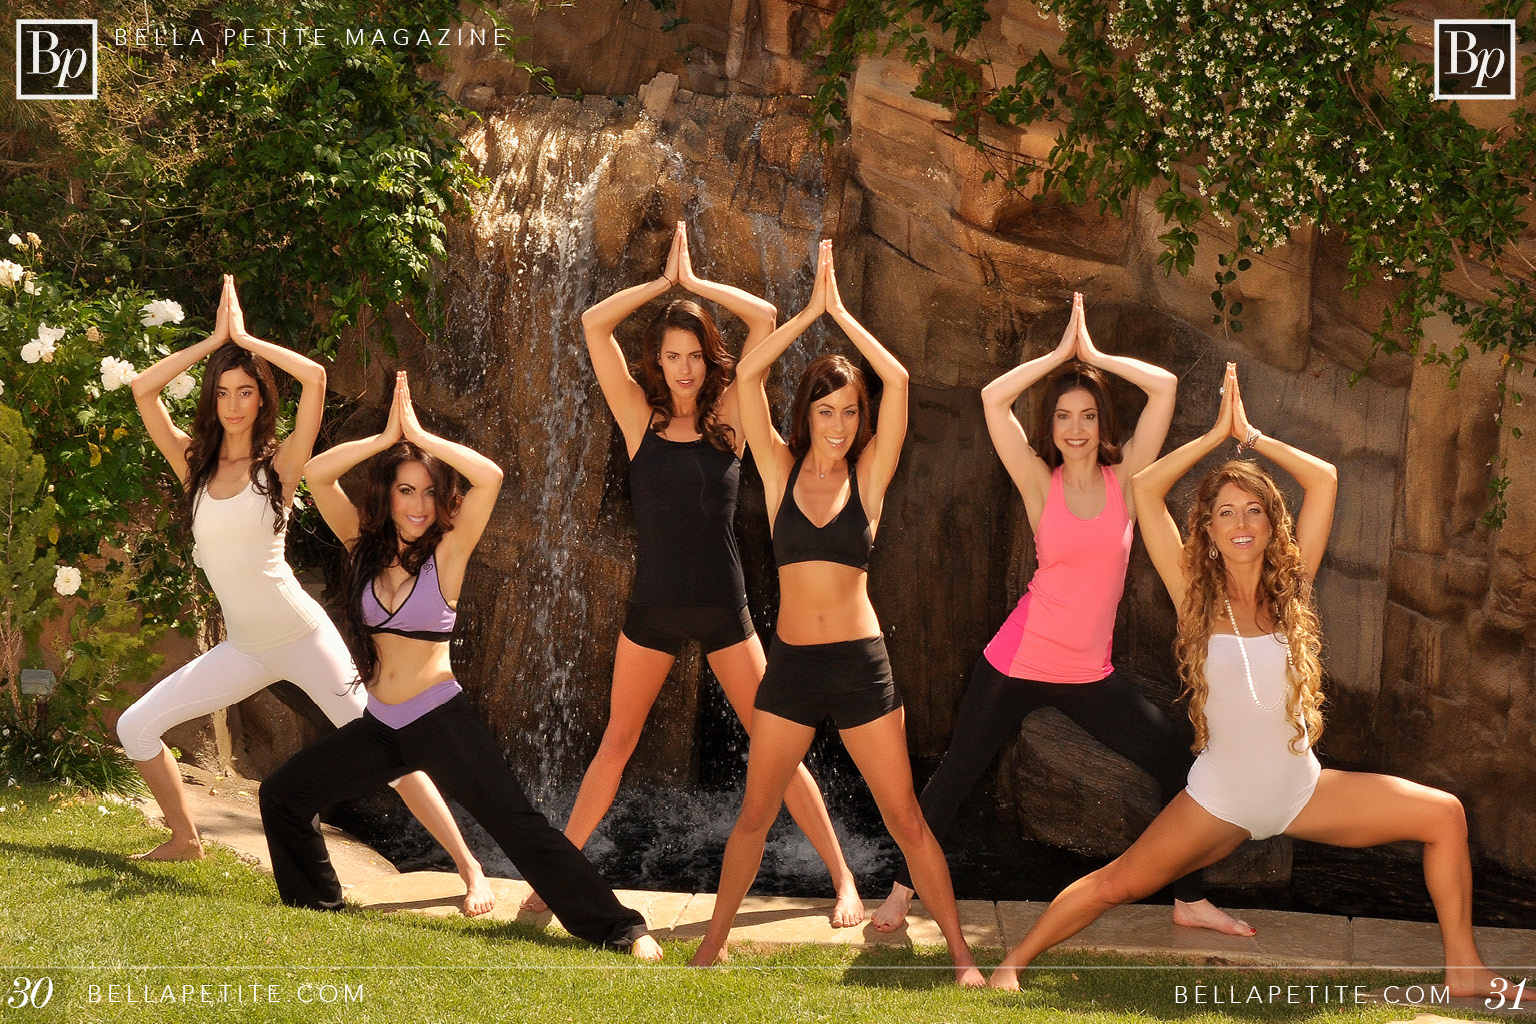 annlauren, yoga, lifestyle,editorial, model, actress, imdb, ann, lauren,